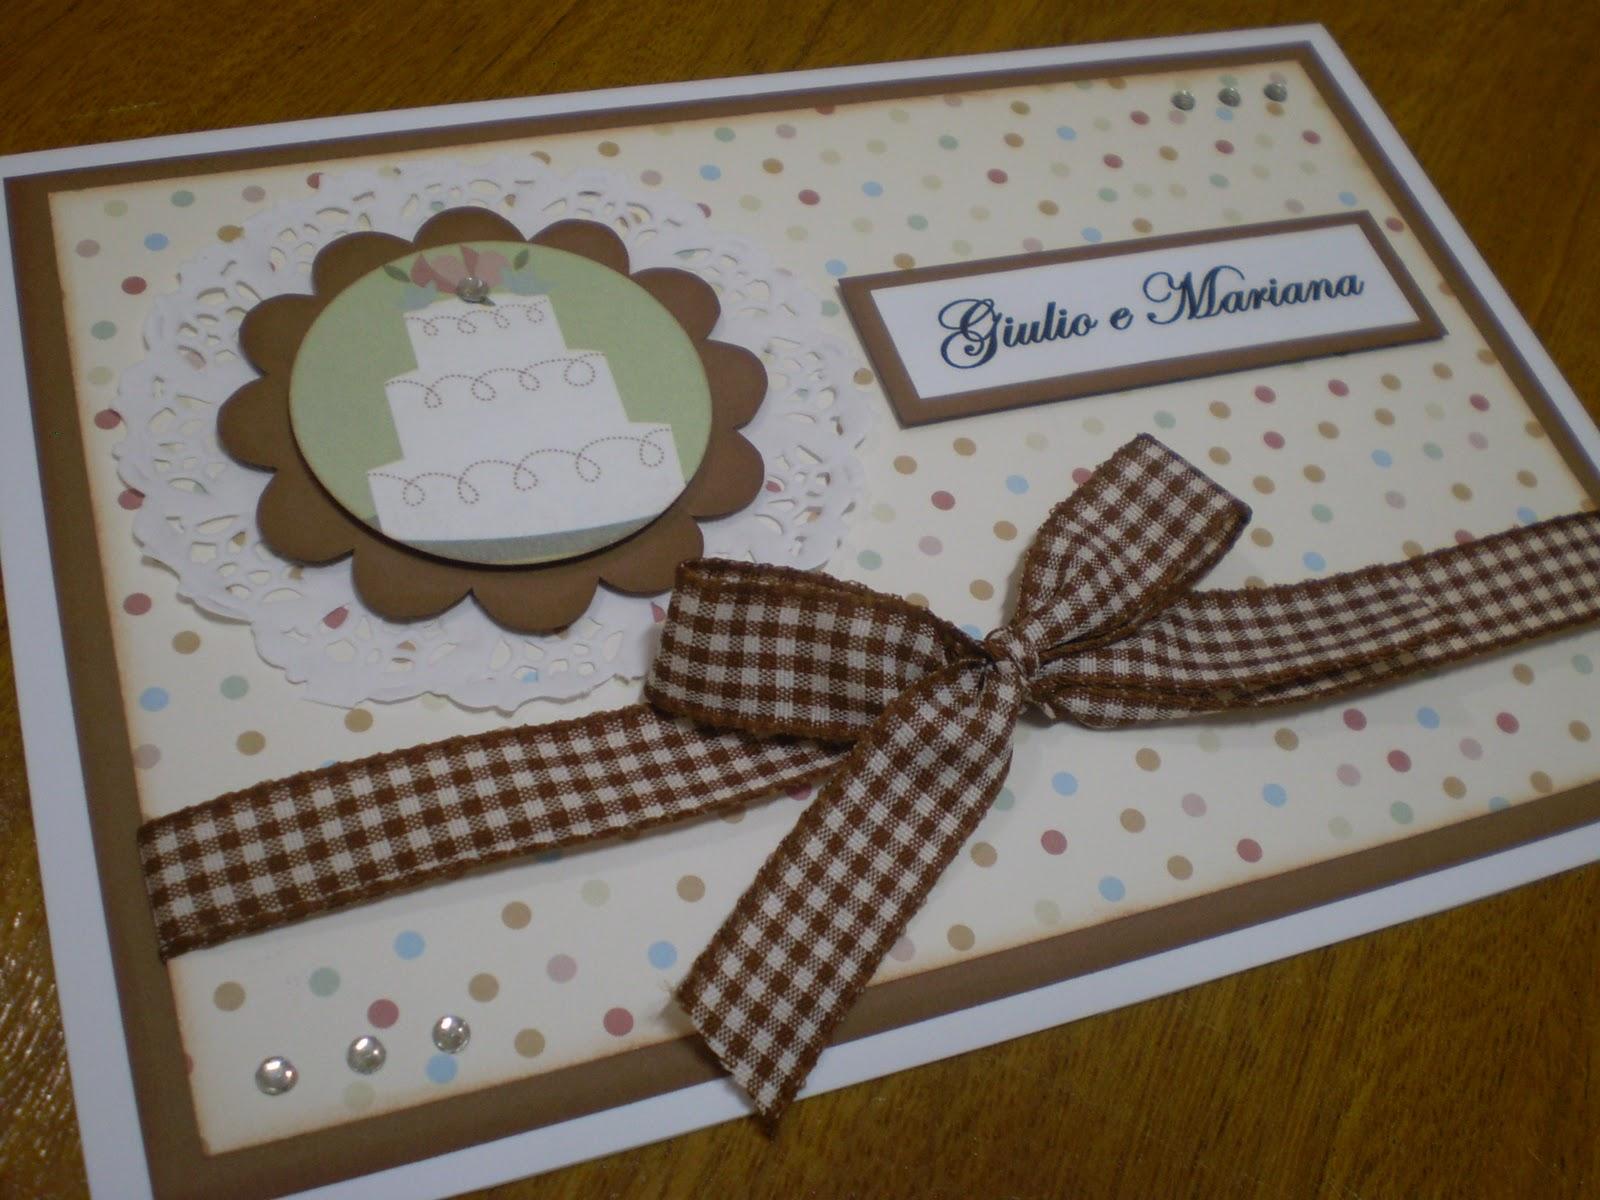 Cartões De Casamento: Adri Sinibaldi Scrapbook: Cartões De Casamento